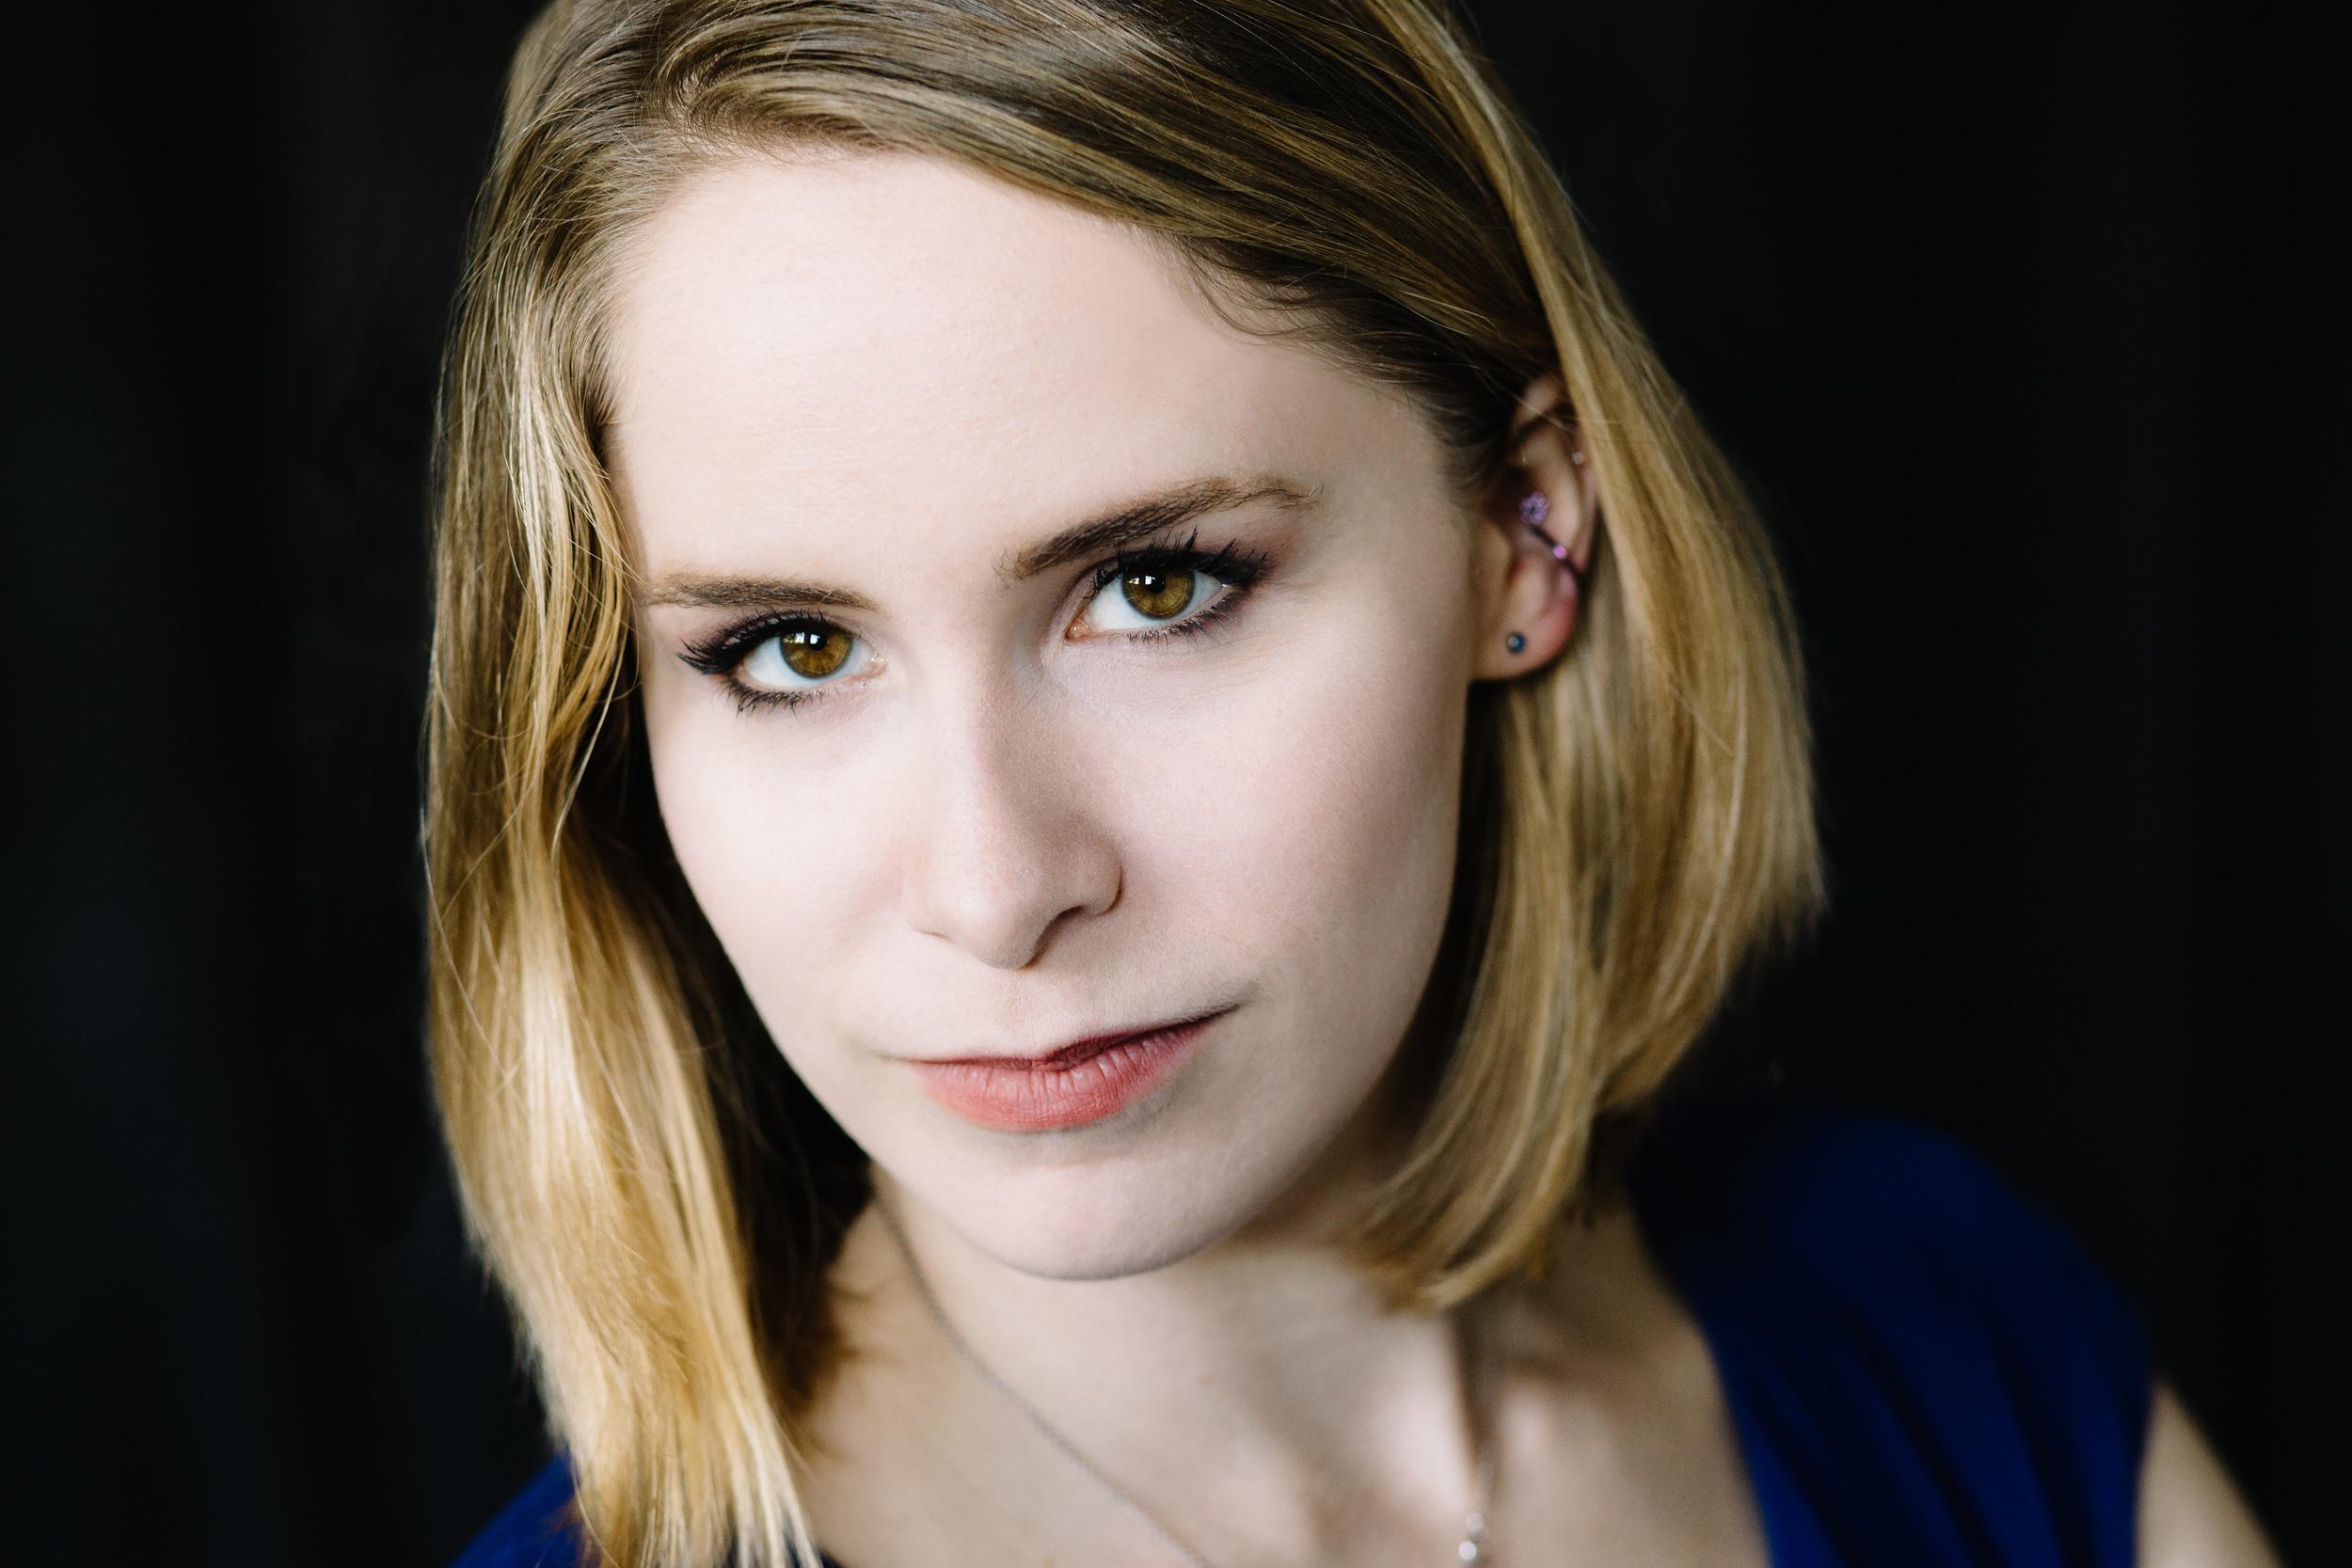 Kristen Keymont